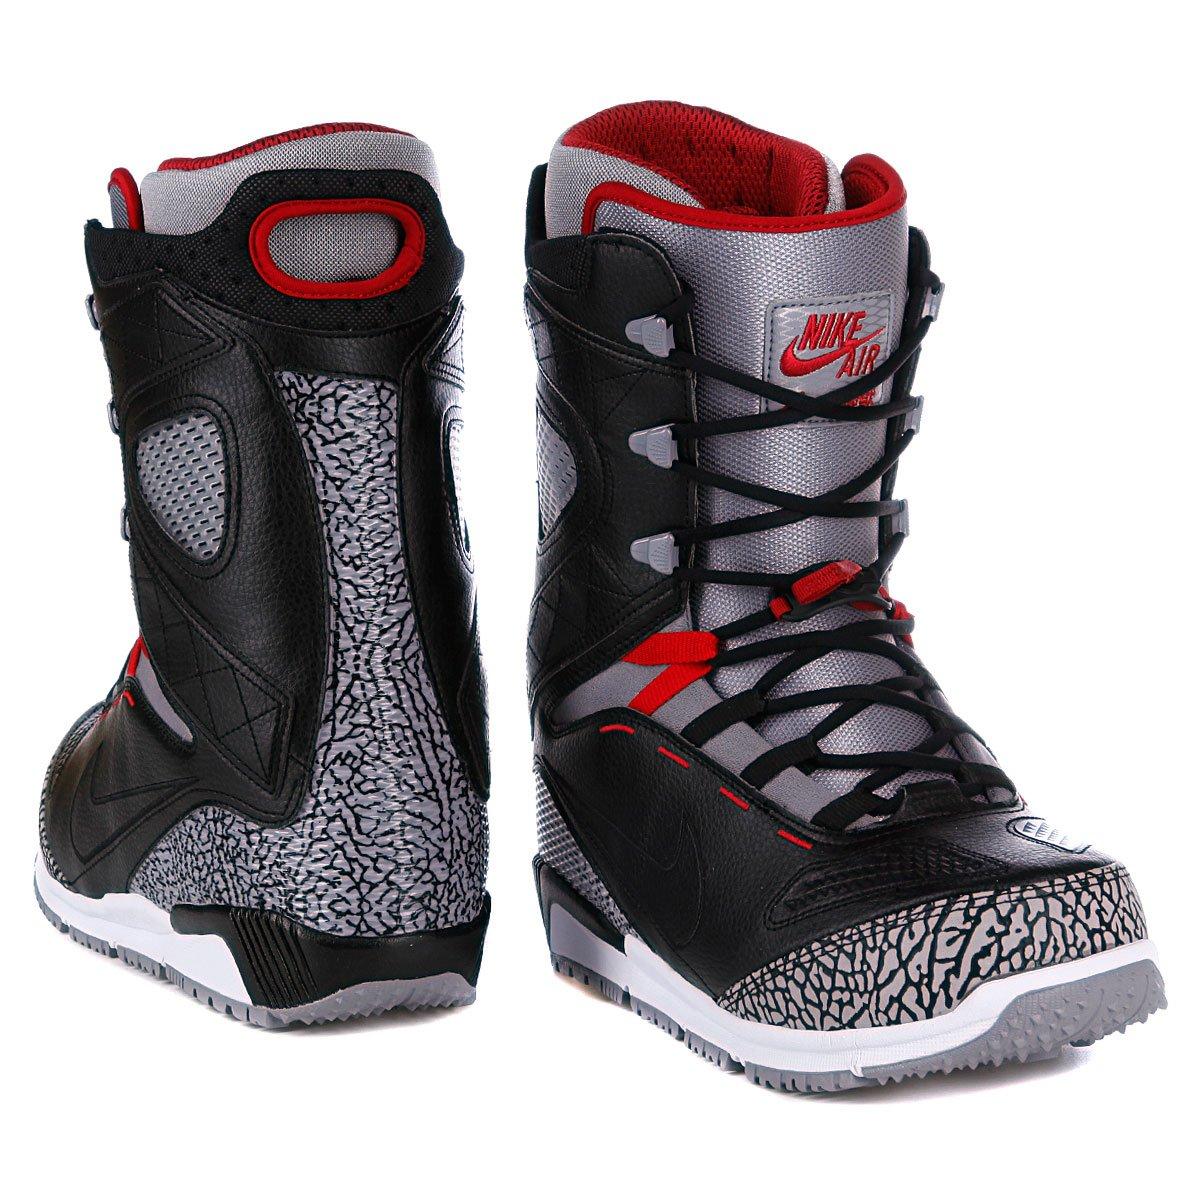 4b2a6dc2 Купить ботинки для сноуборда Nike Zoom Kaiju Black/Black (376276-003 ...